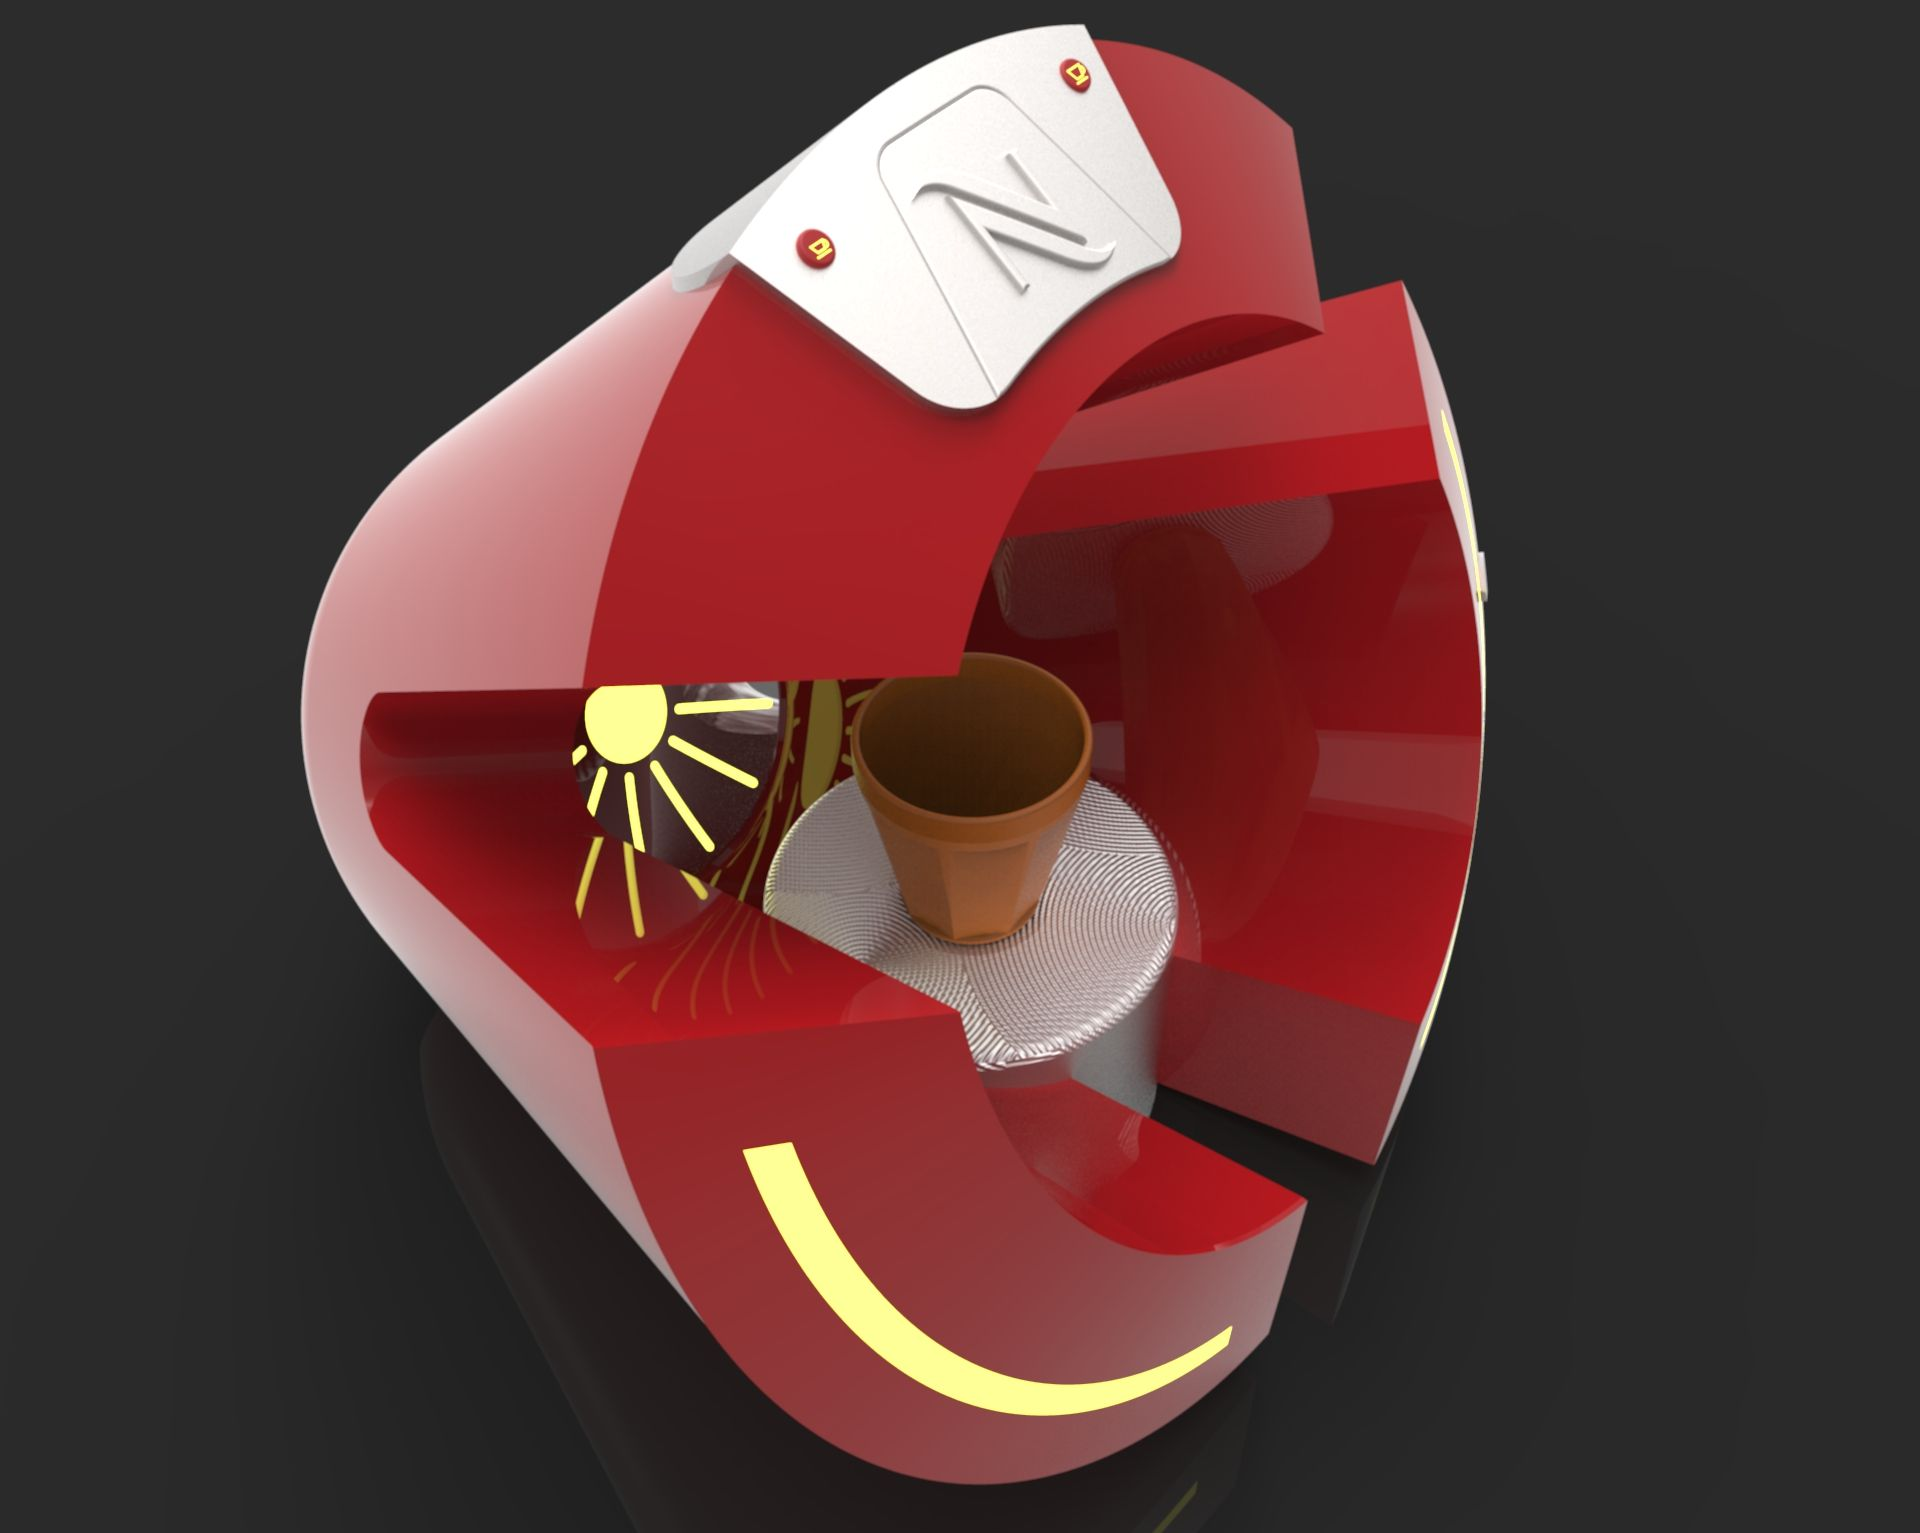 Nespresso CafeInn Coffee Maker - KeyShot,STEP / IGES,CATIA - 3D CAD model - GrabCAD